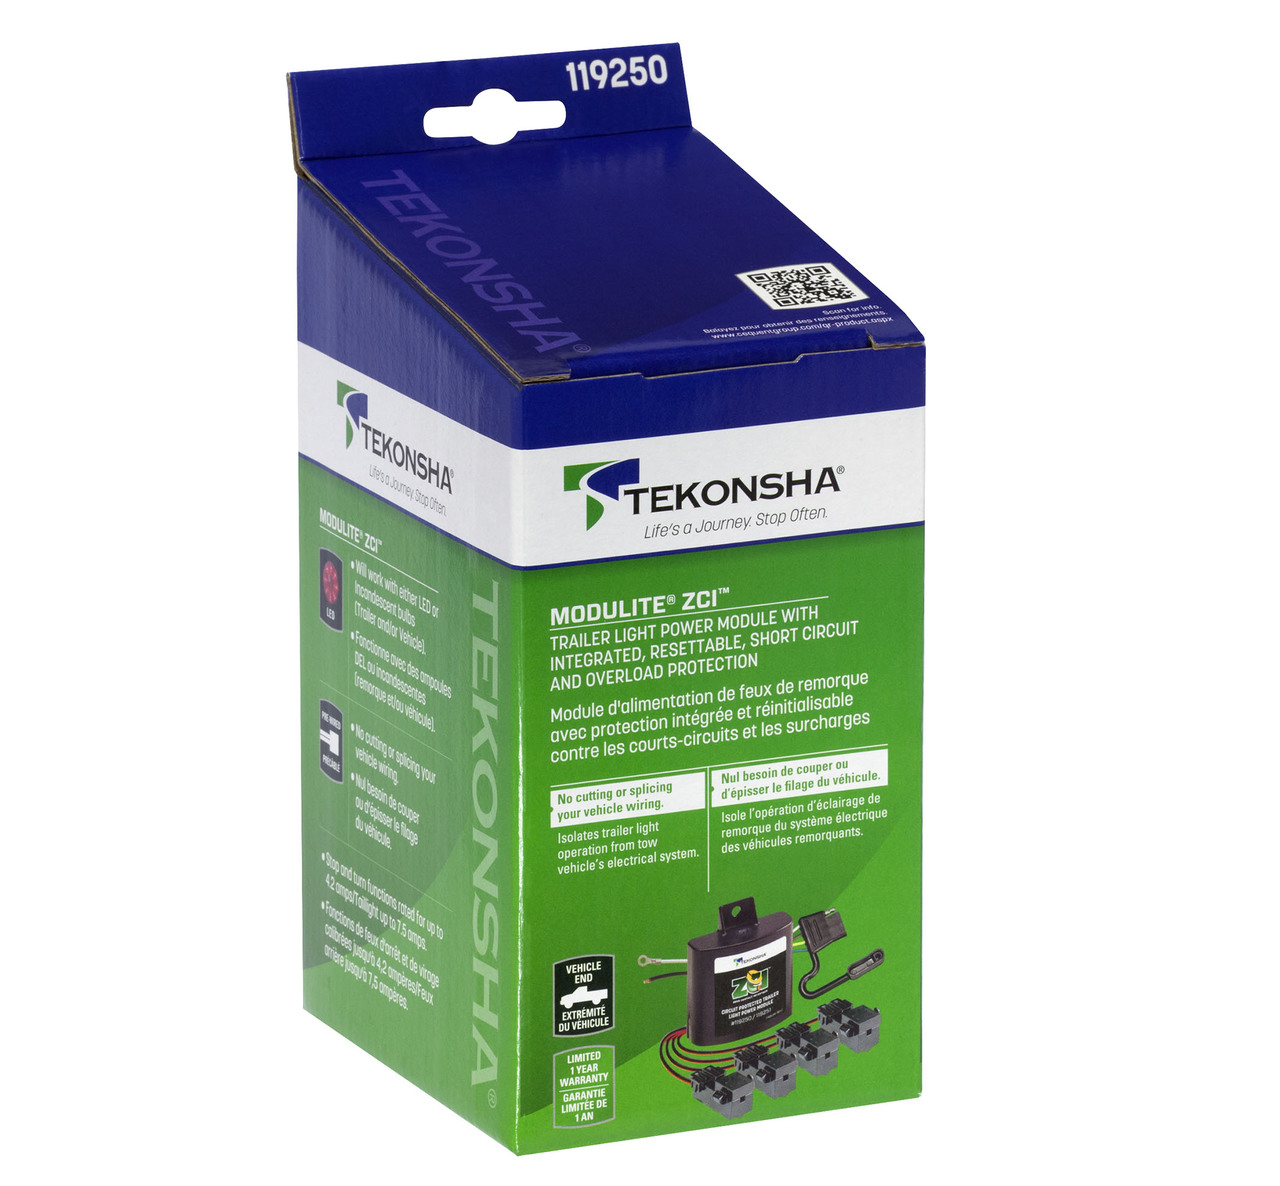 119250 Zci Zero Contact Interface Universal Modulite No Splicing Convertor Vehicle Wiring Products Ltd Croft Trailer Supply